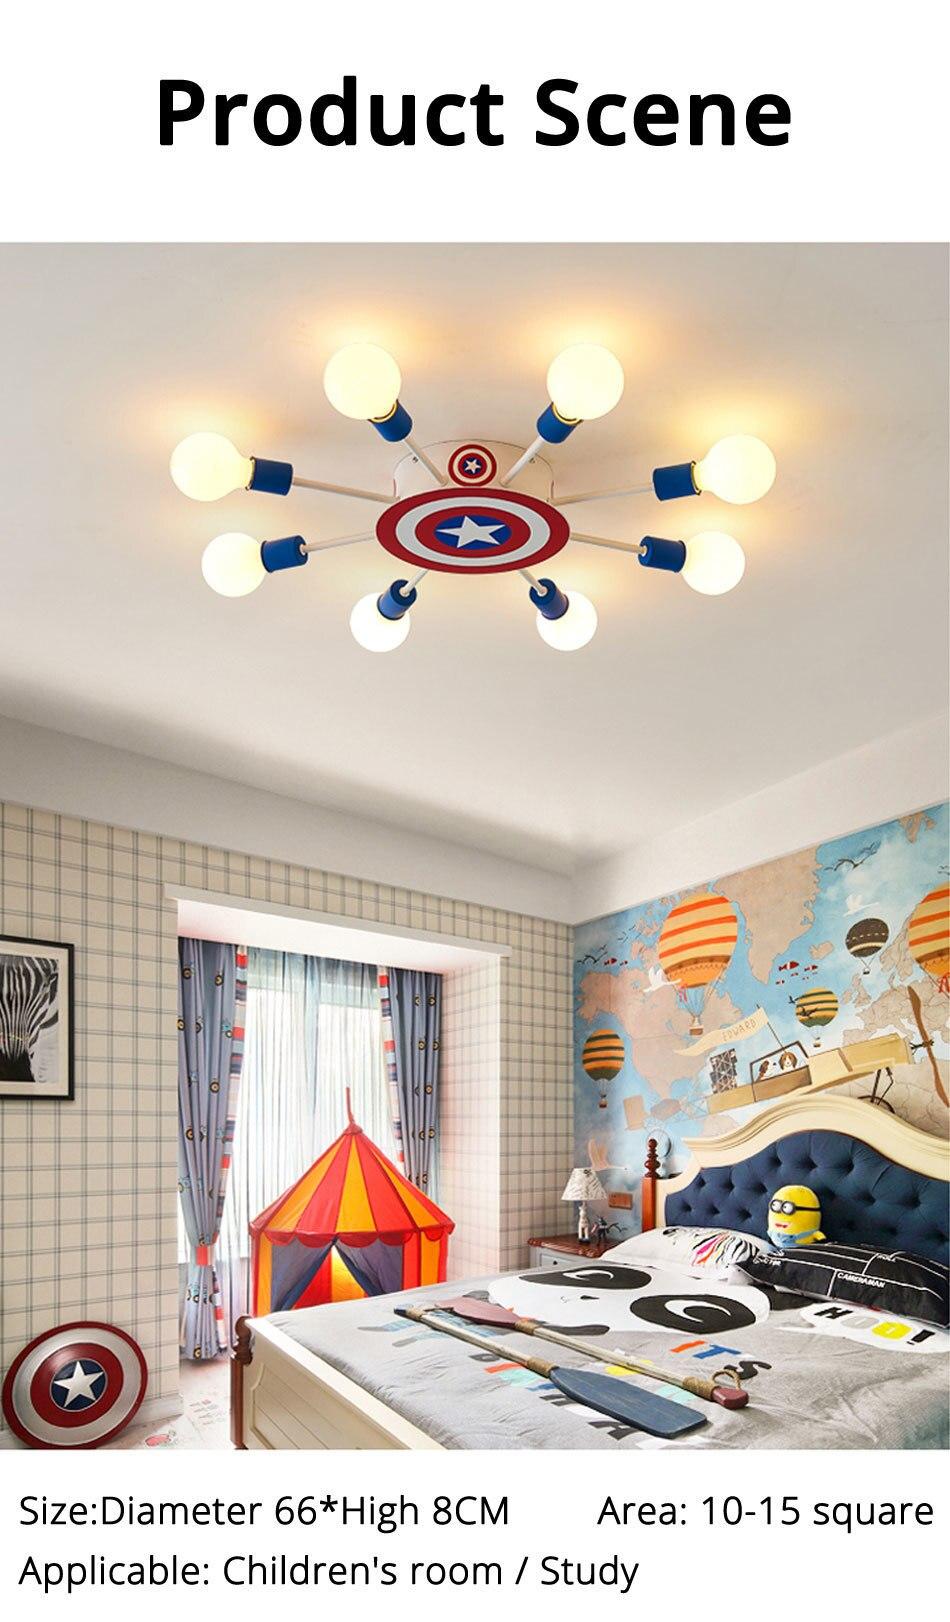 New Design LED ceiling lights with Remote control for Kids Room | Children's Room Lighting Best Children's Lighting & Home Decor Online Store